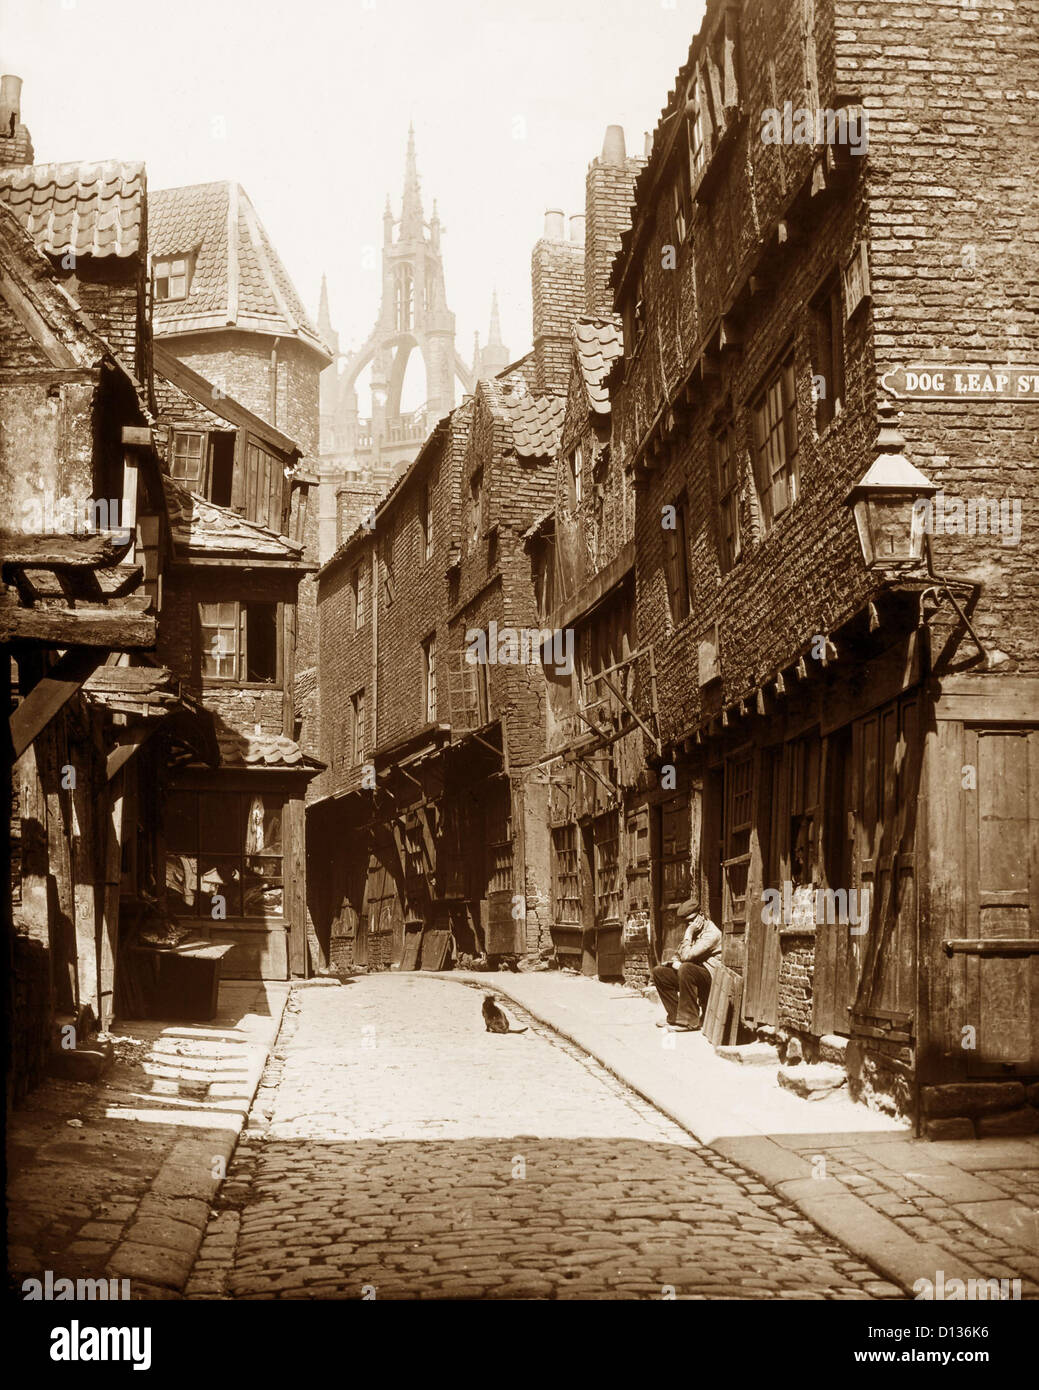 Castle Garth Newcastle Upon Tyne Victorian period - Stock Image